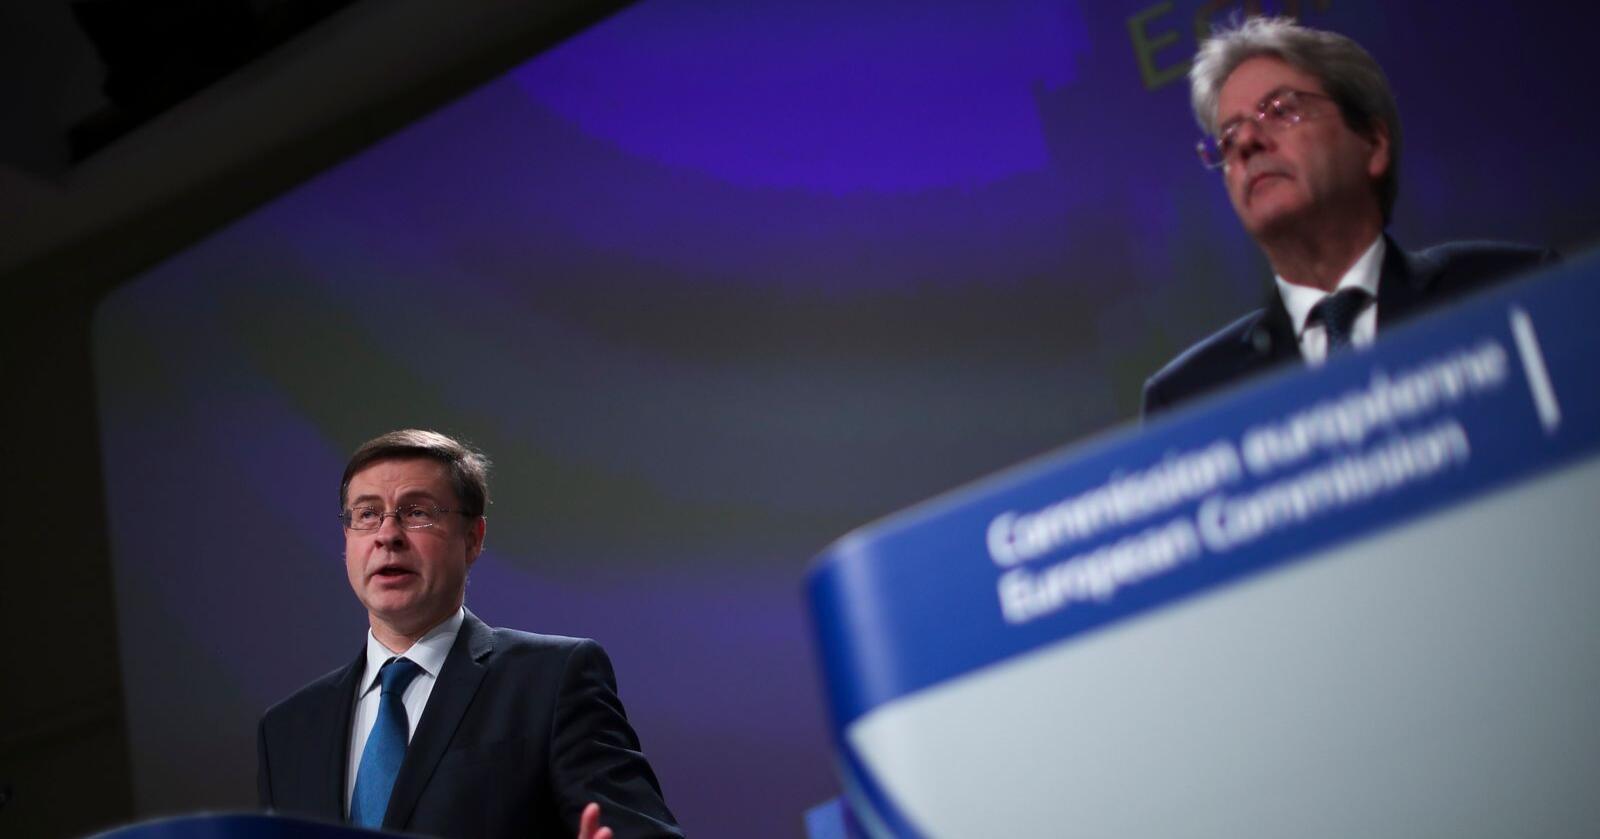 EU-kommissærene Valdis Dombrovskis (t.v.) og Paolo Gentiloni forventer fortsatt vekst i unionens økonomi. Arkivfoto: Francisco Seco / AP / NTB scanpi